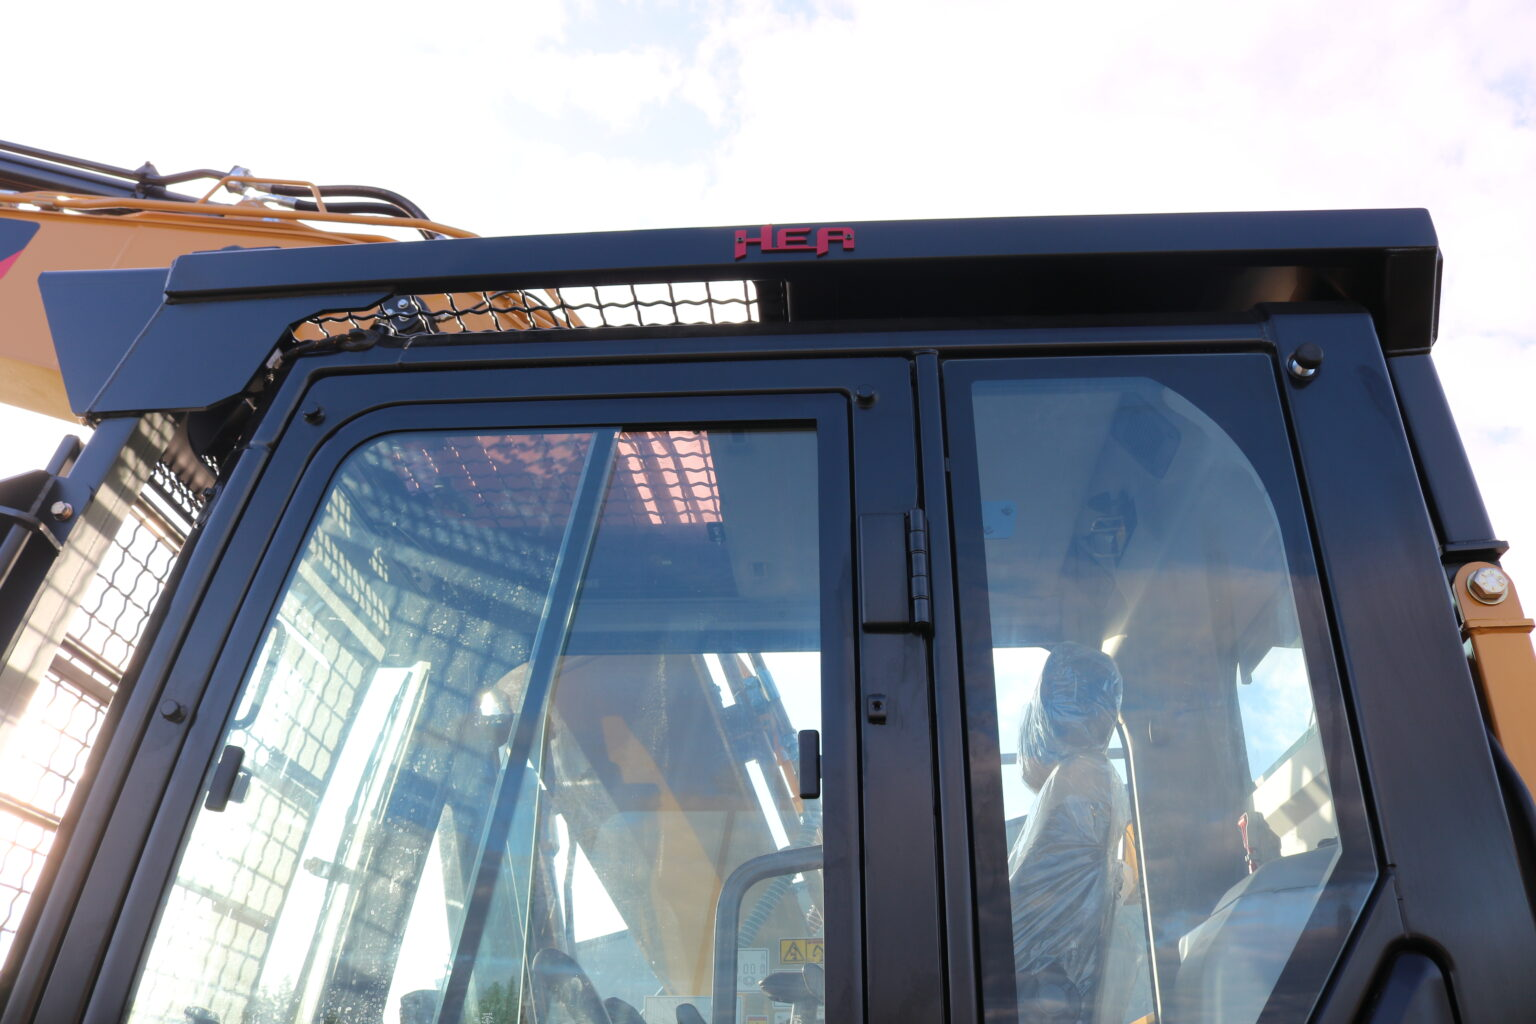 Caterpillar 316F Custom Bolt on Screen and Top Cab Guard